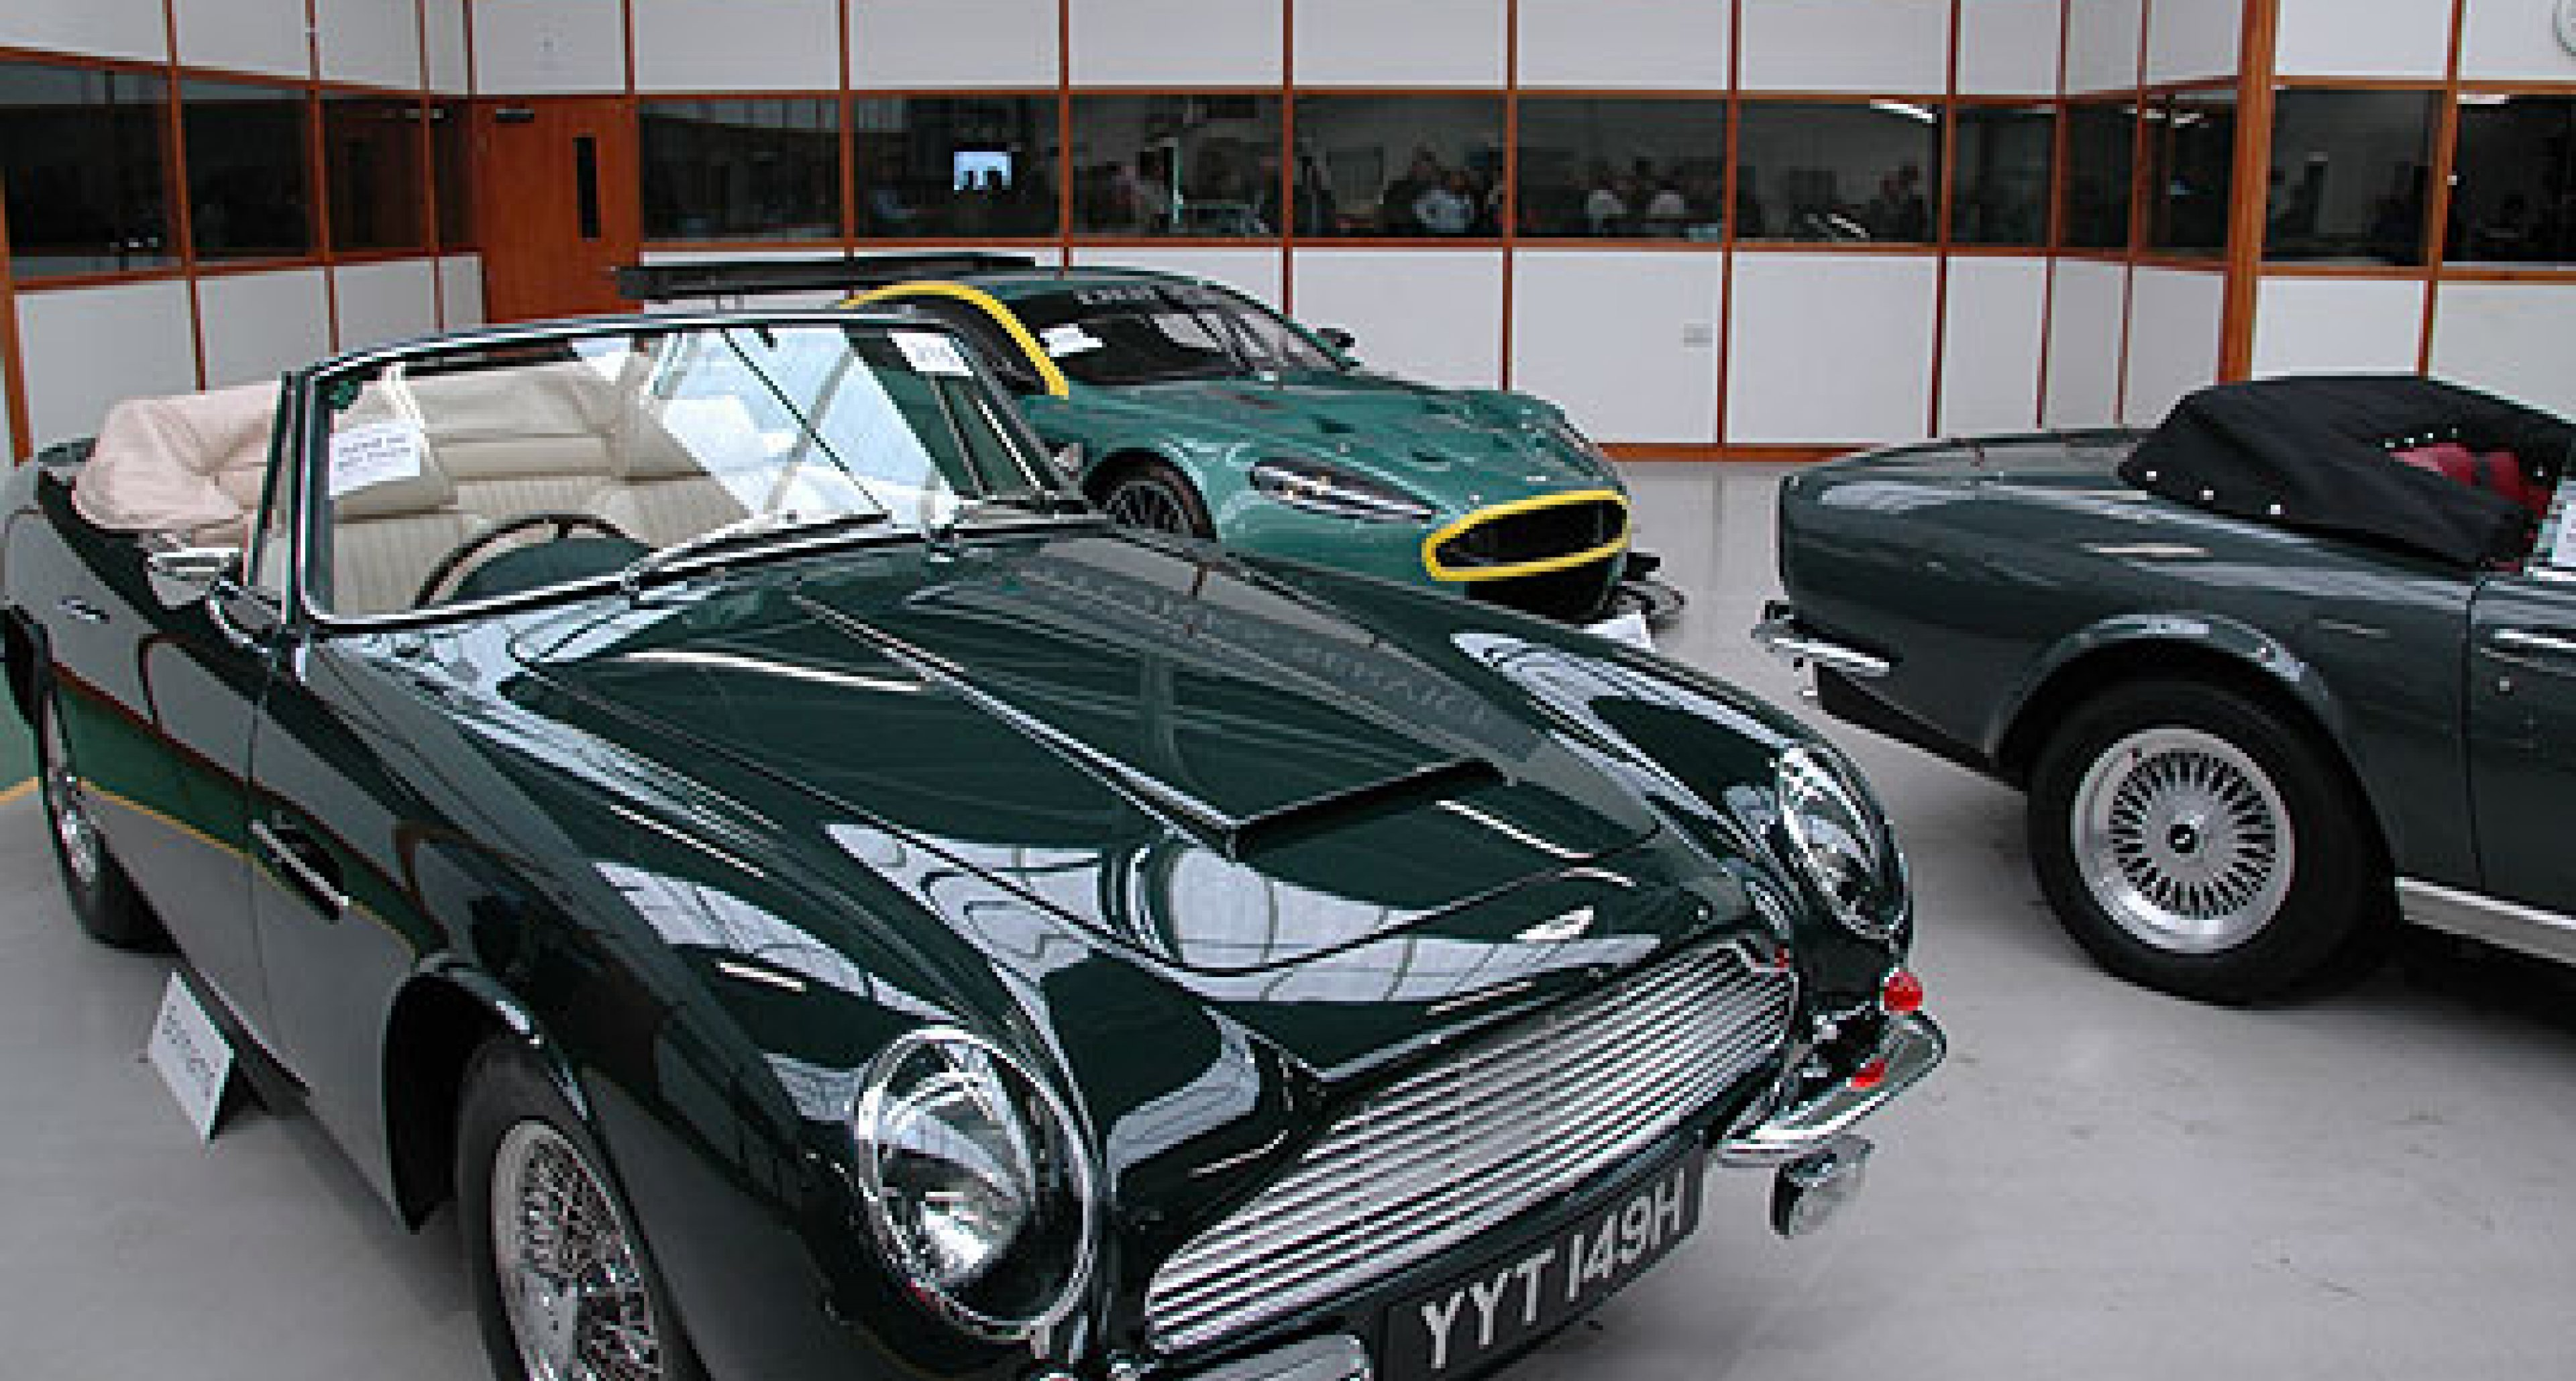 Bonhams Aston Martin Sale at Newport Pagnell -  12th May 2007 - Review